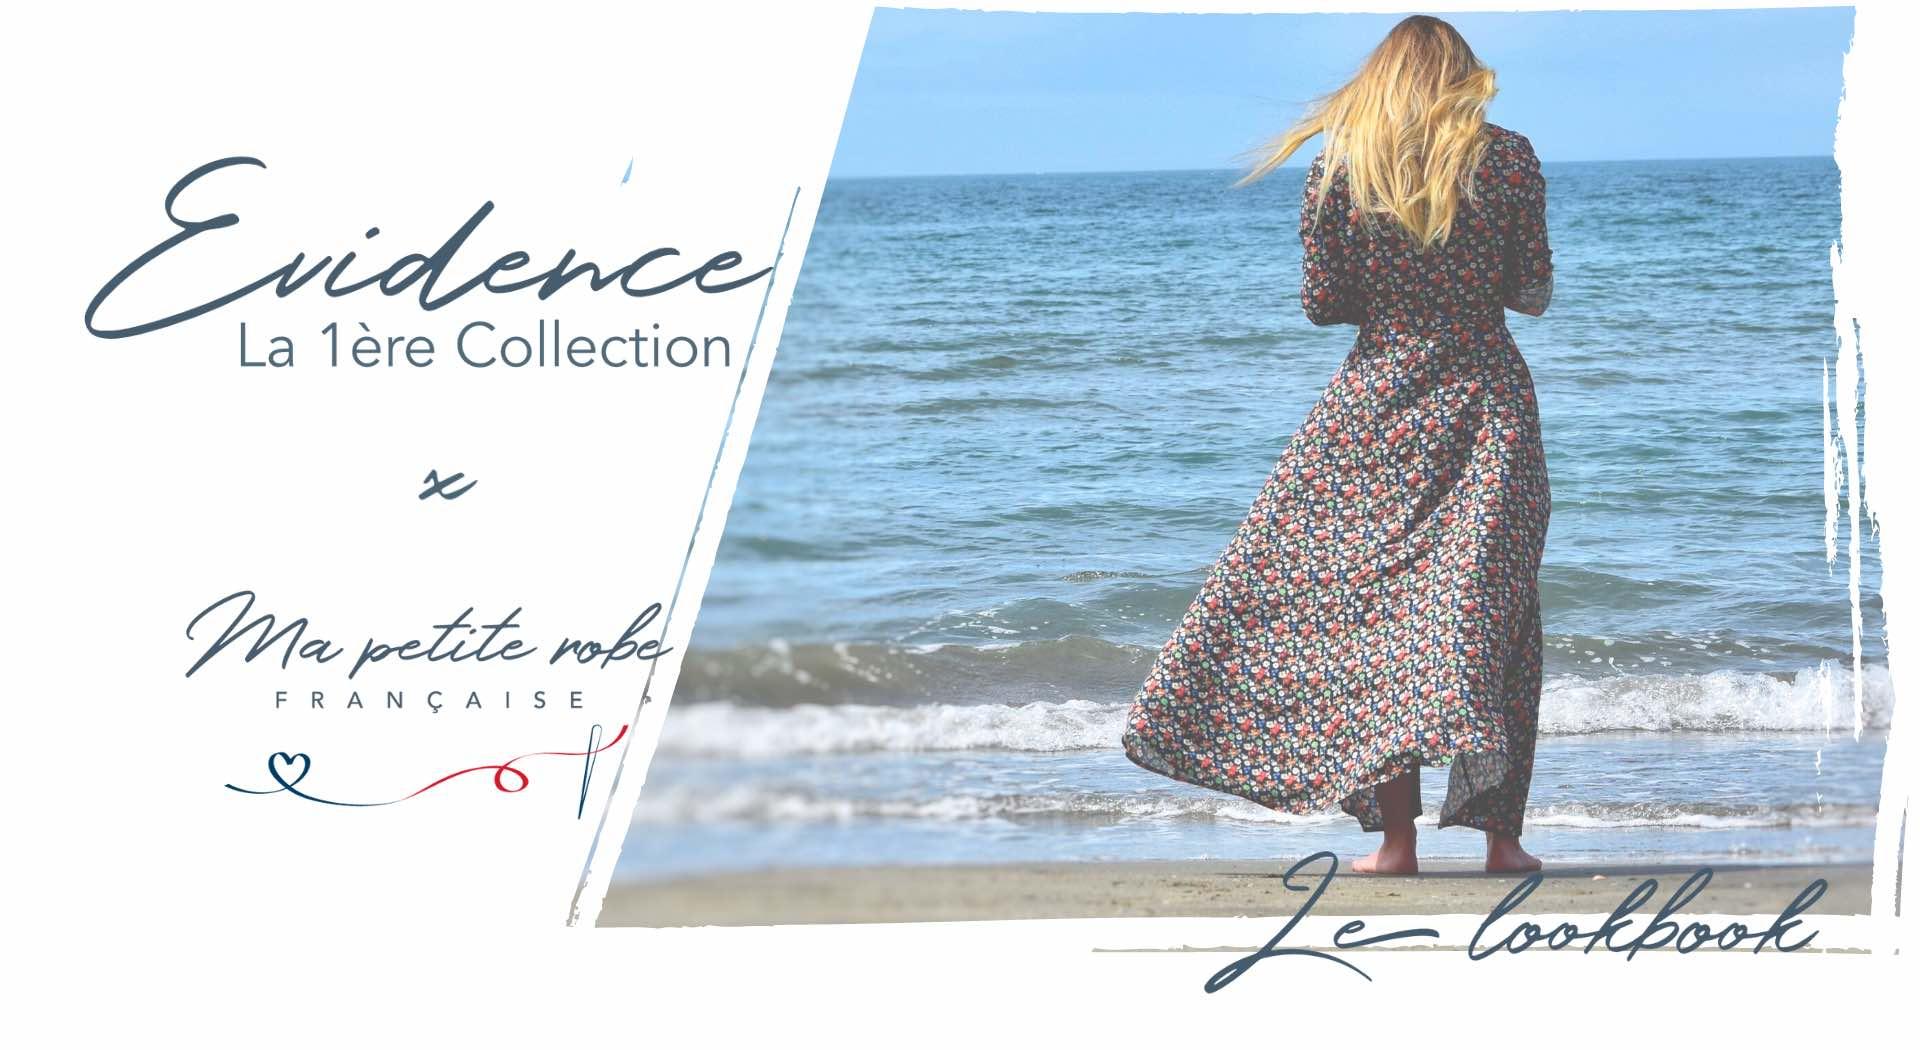 Img-Accueil-LookbookEvidence_Mapetiterobefrancaise